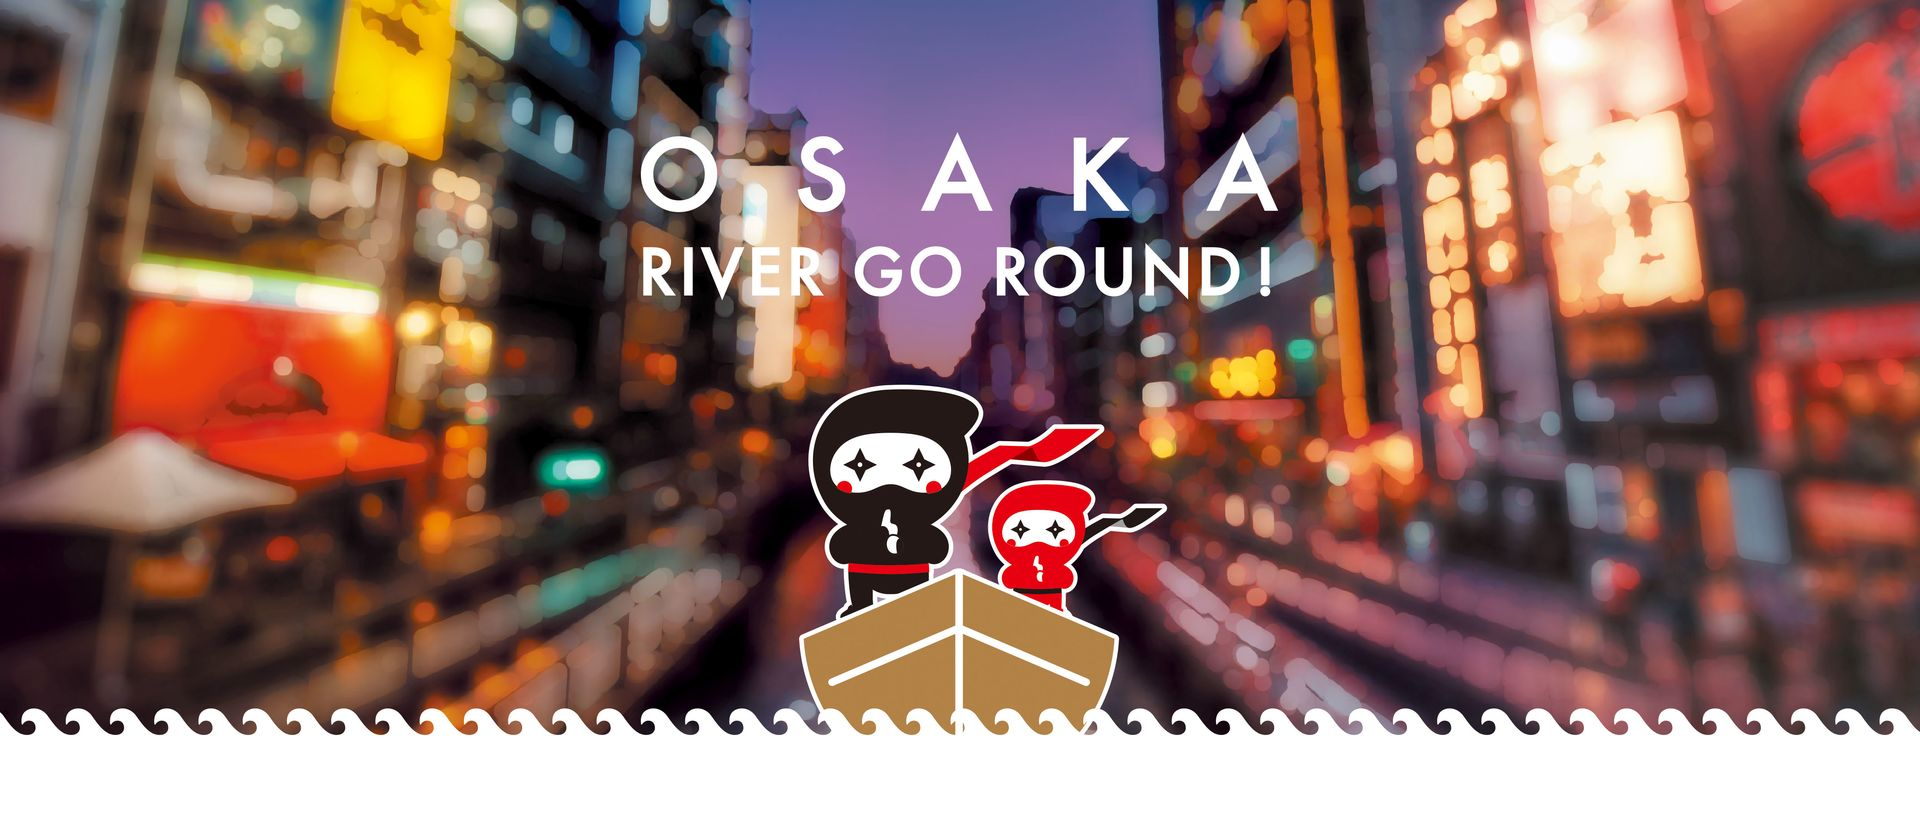 OSAKA RIVER GO ROUND!